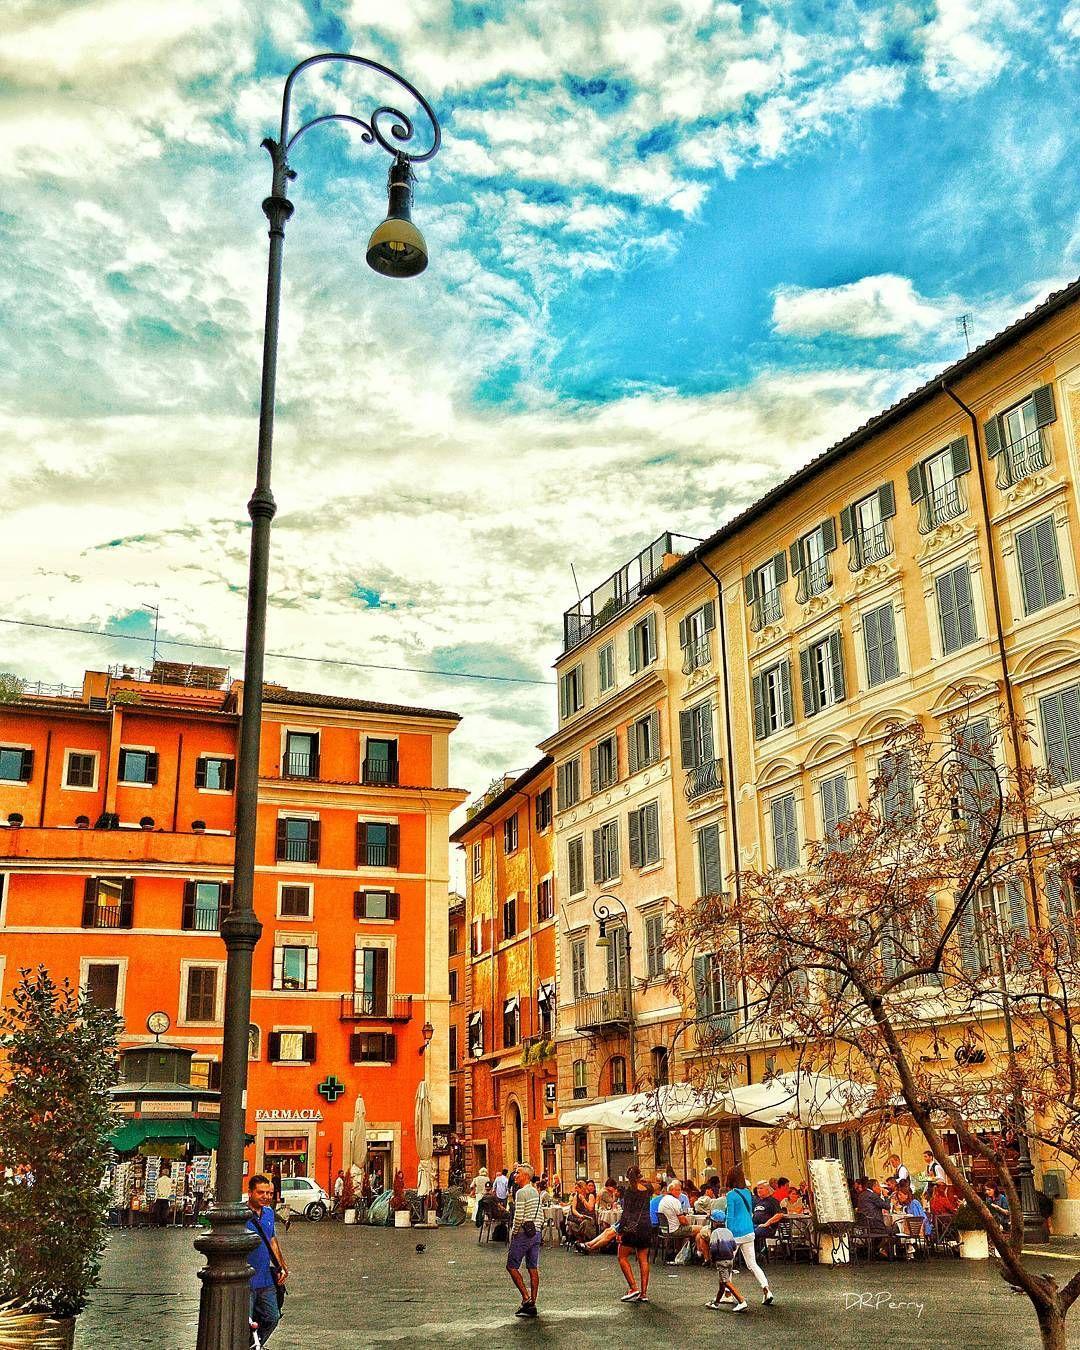 """Casual September Evening in San Lorenzo"" - Roma #photobydperry #rome #italy #loves_united_lazio ##wp #Italia_super_pics #ig_italy #ig_rome #going_into_details #loves_united_roma #spgitaly #igerslazio #loves_united_places #loves_united_friends #whatitalyis #ilikeitaly #best_Europe #loves_united_lazio #pocket_Italy #europa_insta #gallery_of_all #total_Italy #loves_united_team #yallerslazio  #italy_hidden_gem #igw_italy #fdnf #lazio #ig_lazio_ #seetoshare"